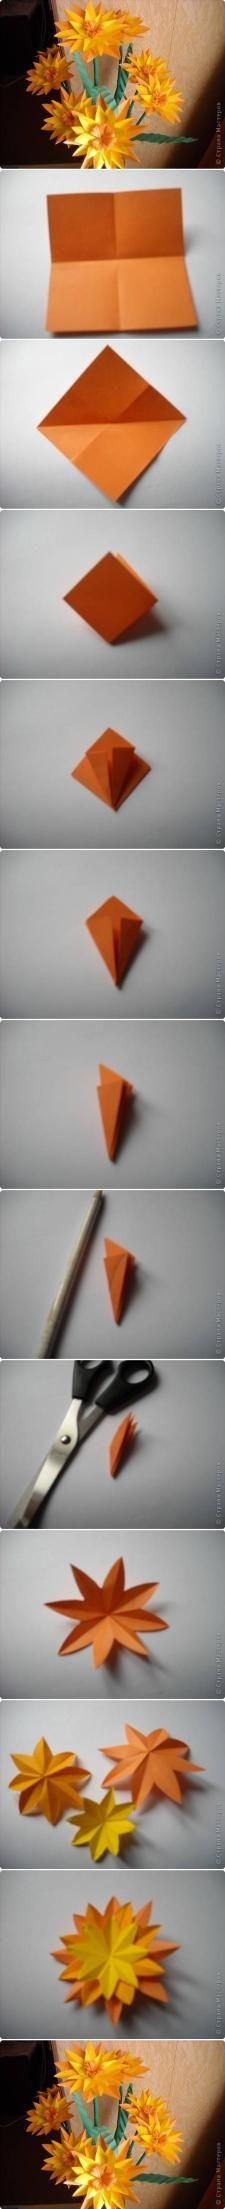 paper Crafts Ideas, Craft Ideas on paper Crafts